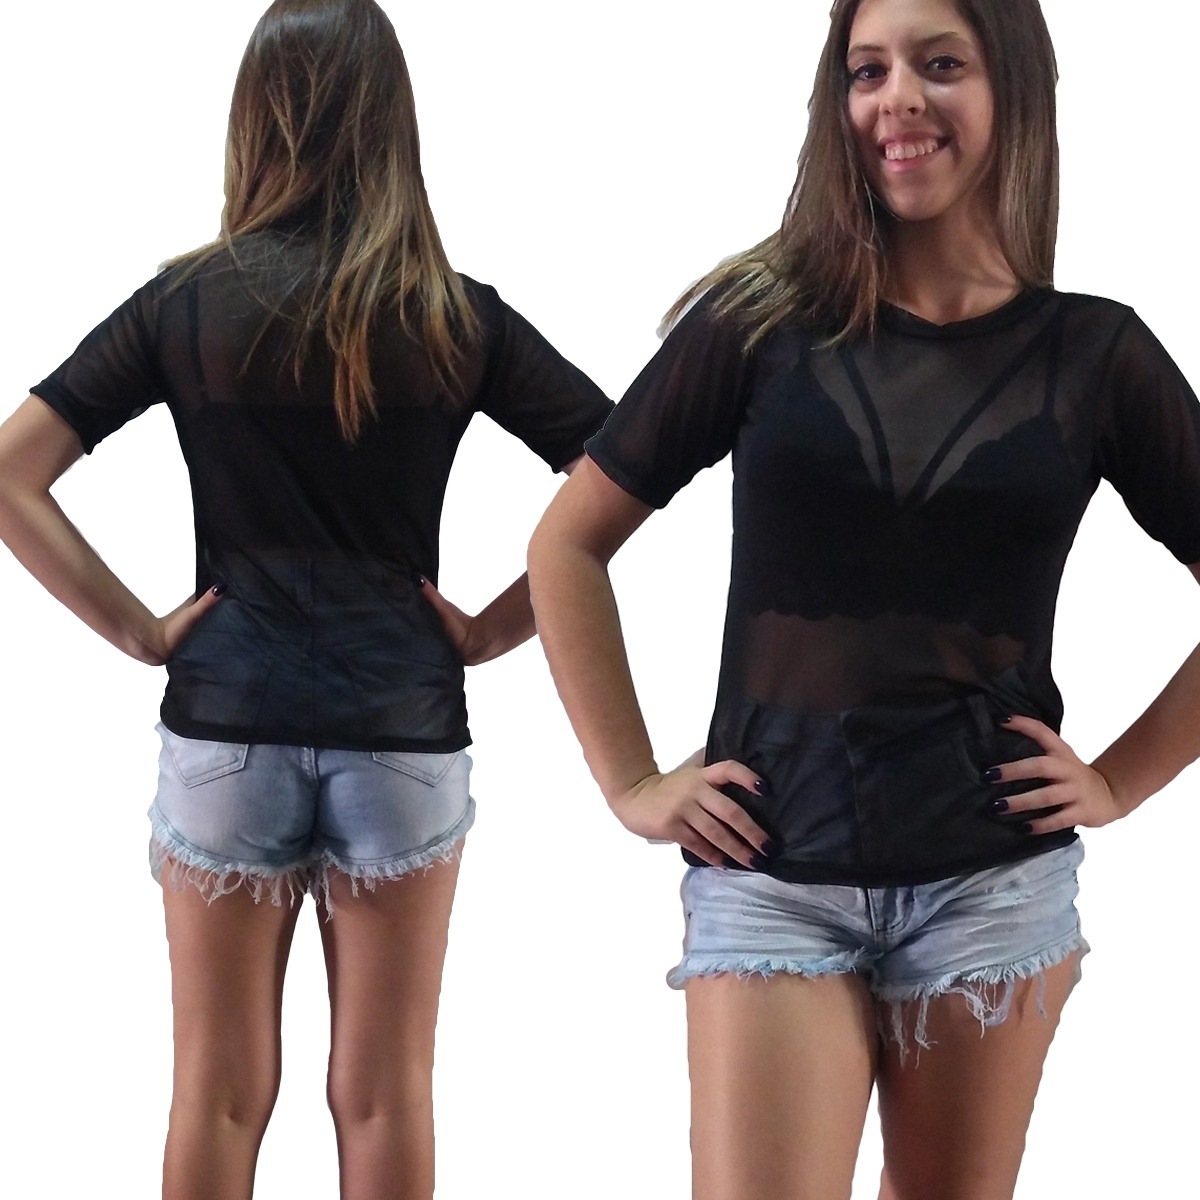 99639ca06c9ad mercado livre  mercadolivre  comprar  blusas femininas  roupas femininas   atacado  varejo